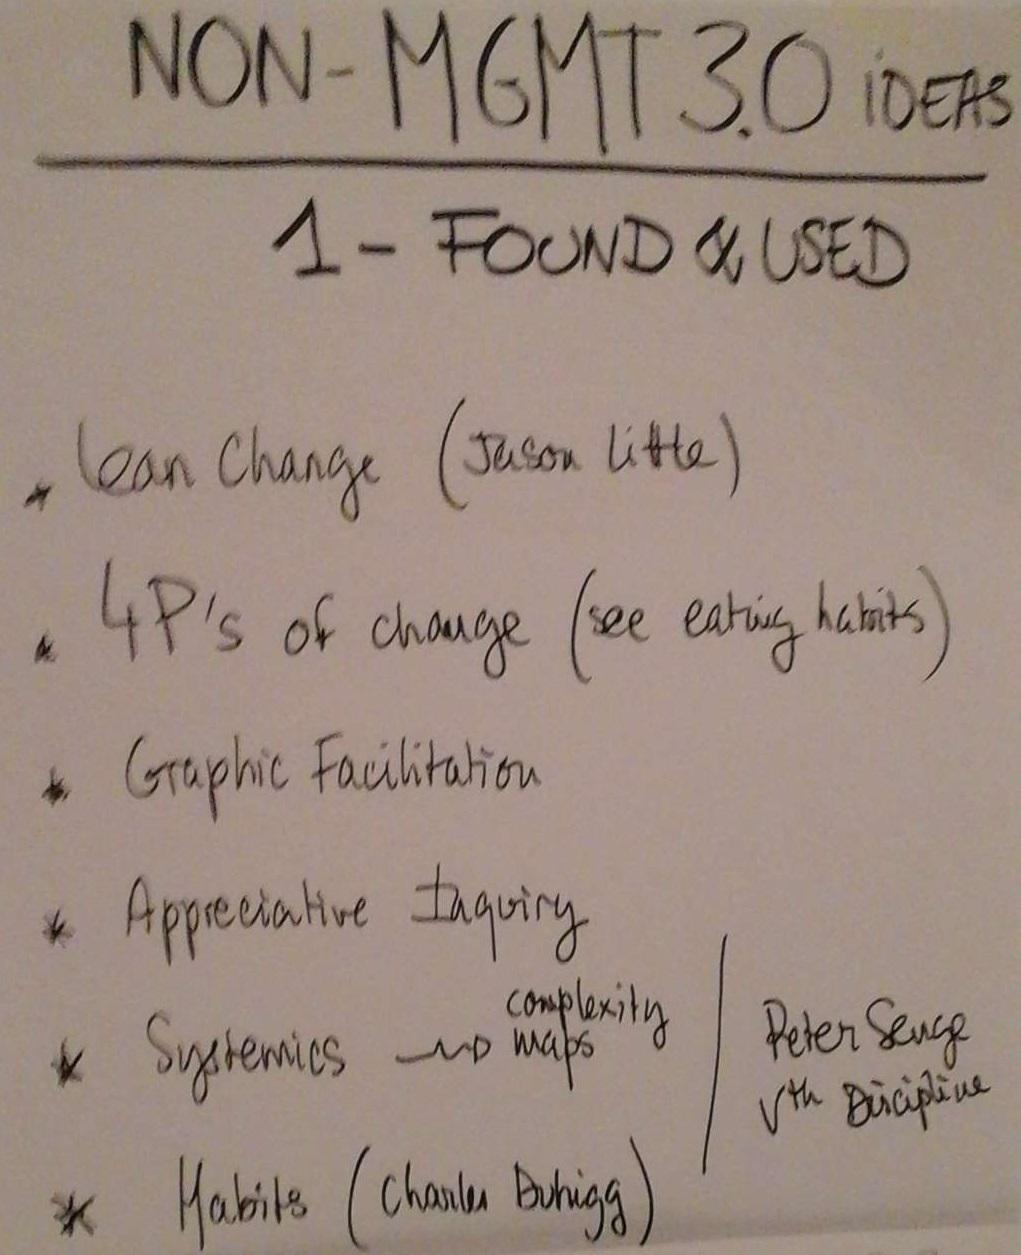 Résultats Non-Management 3.0 1-Found&Used